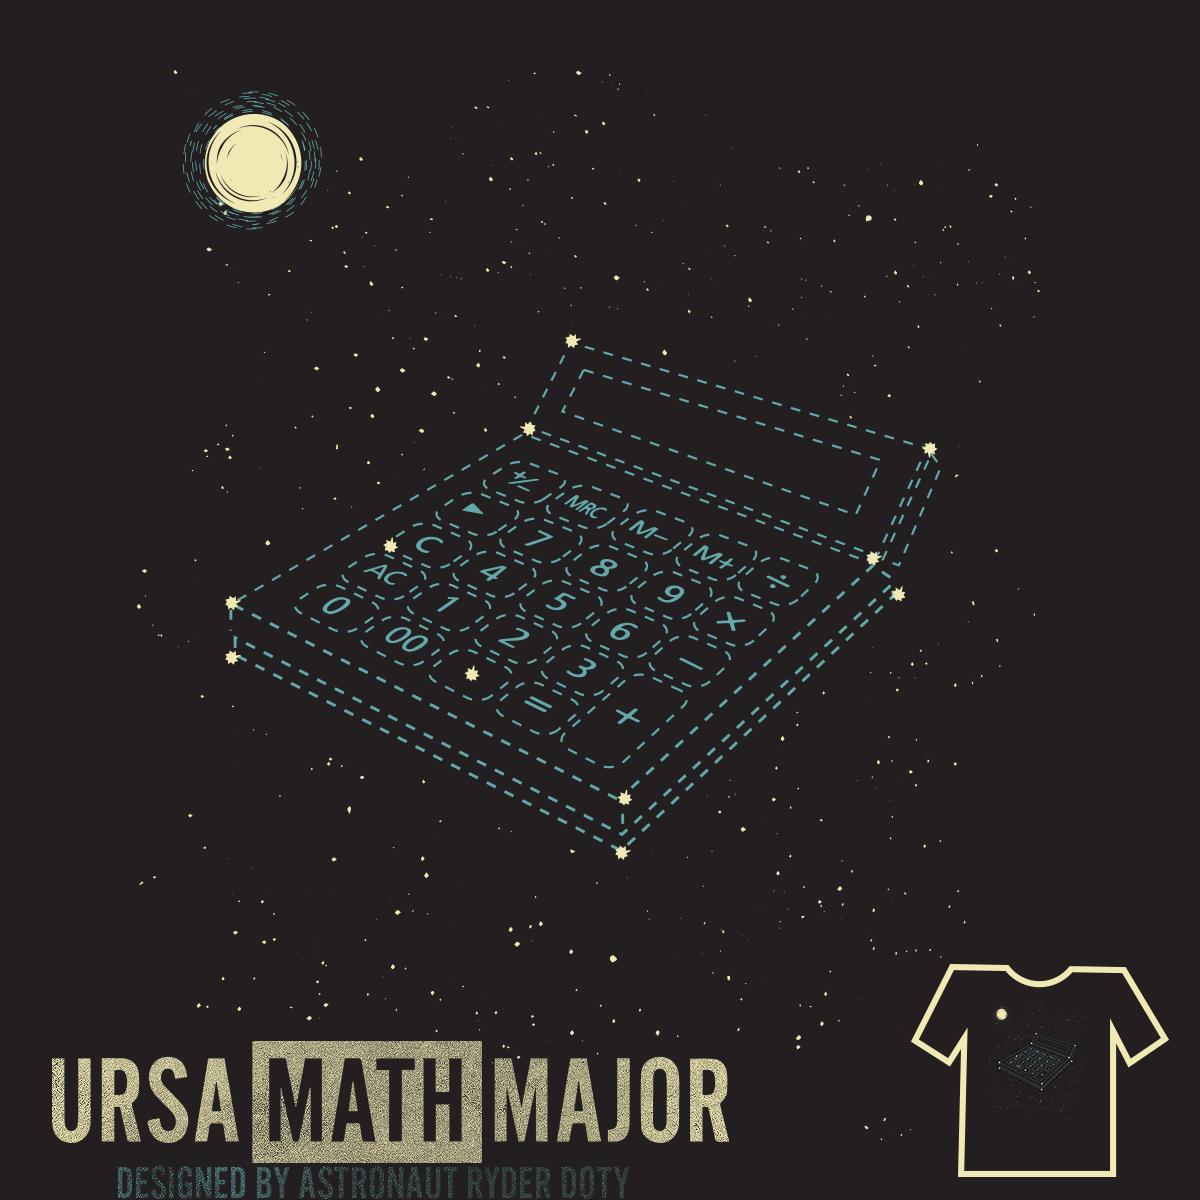 URSA MATH MAJOR by Ryder on Threadless